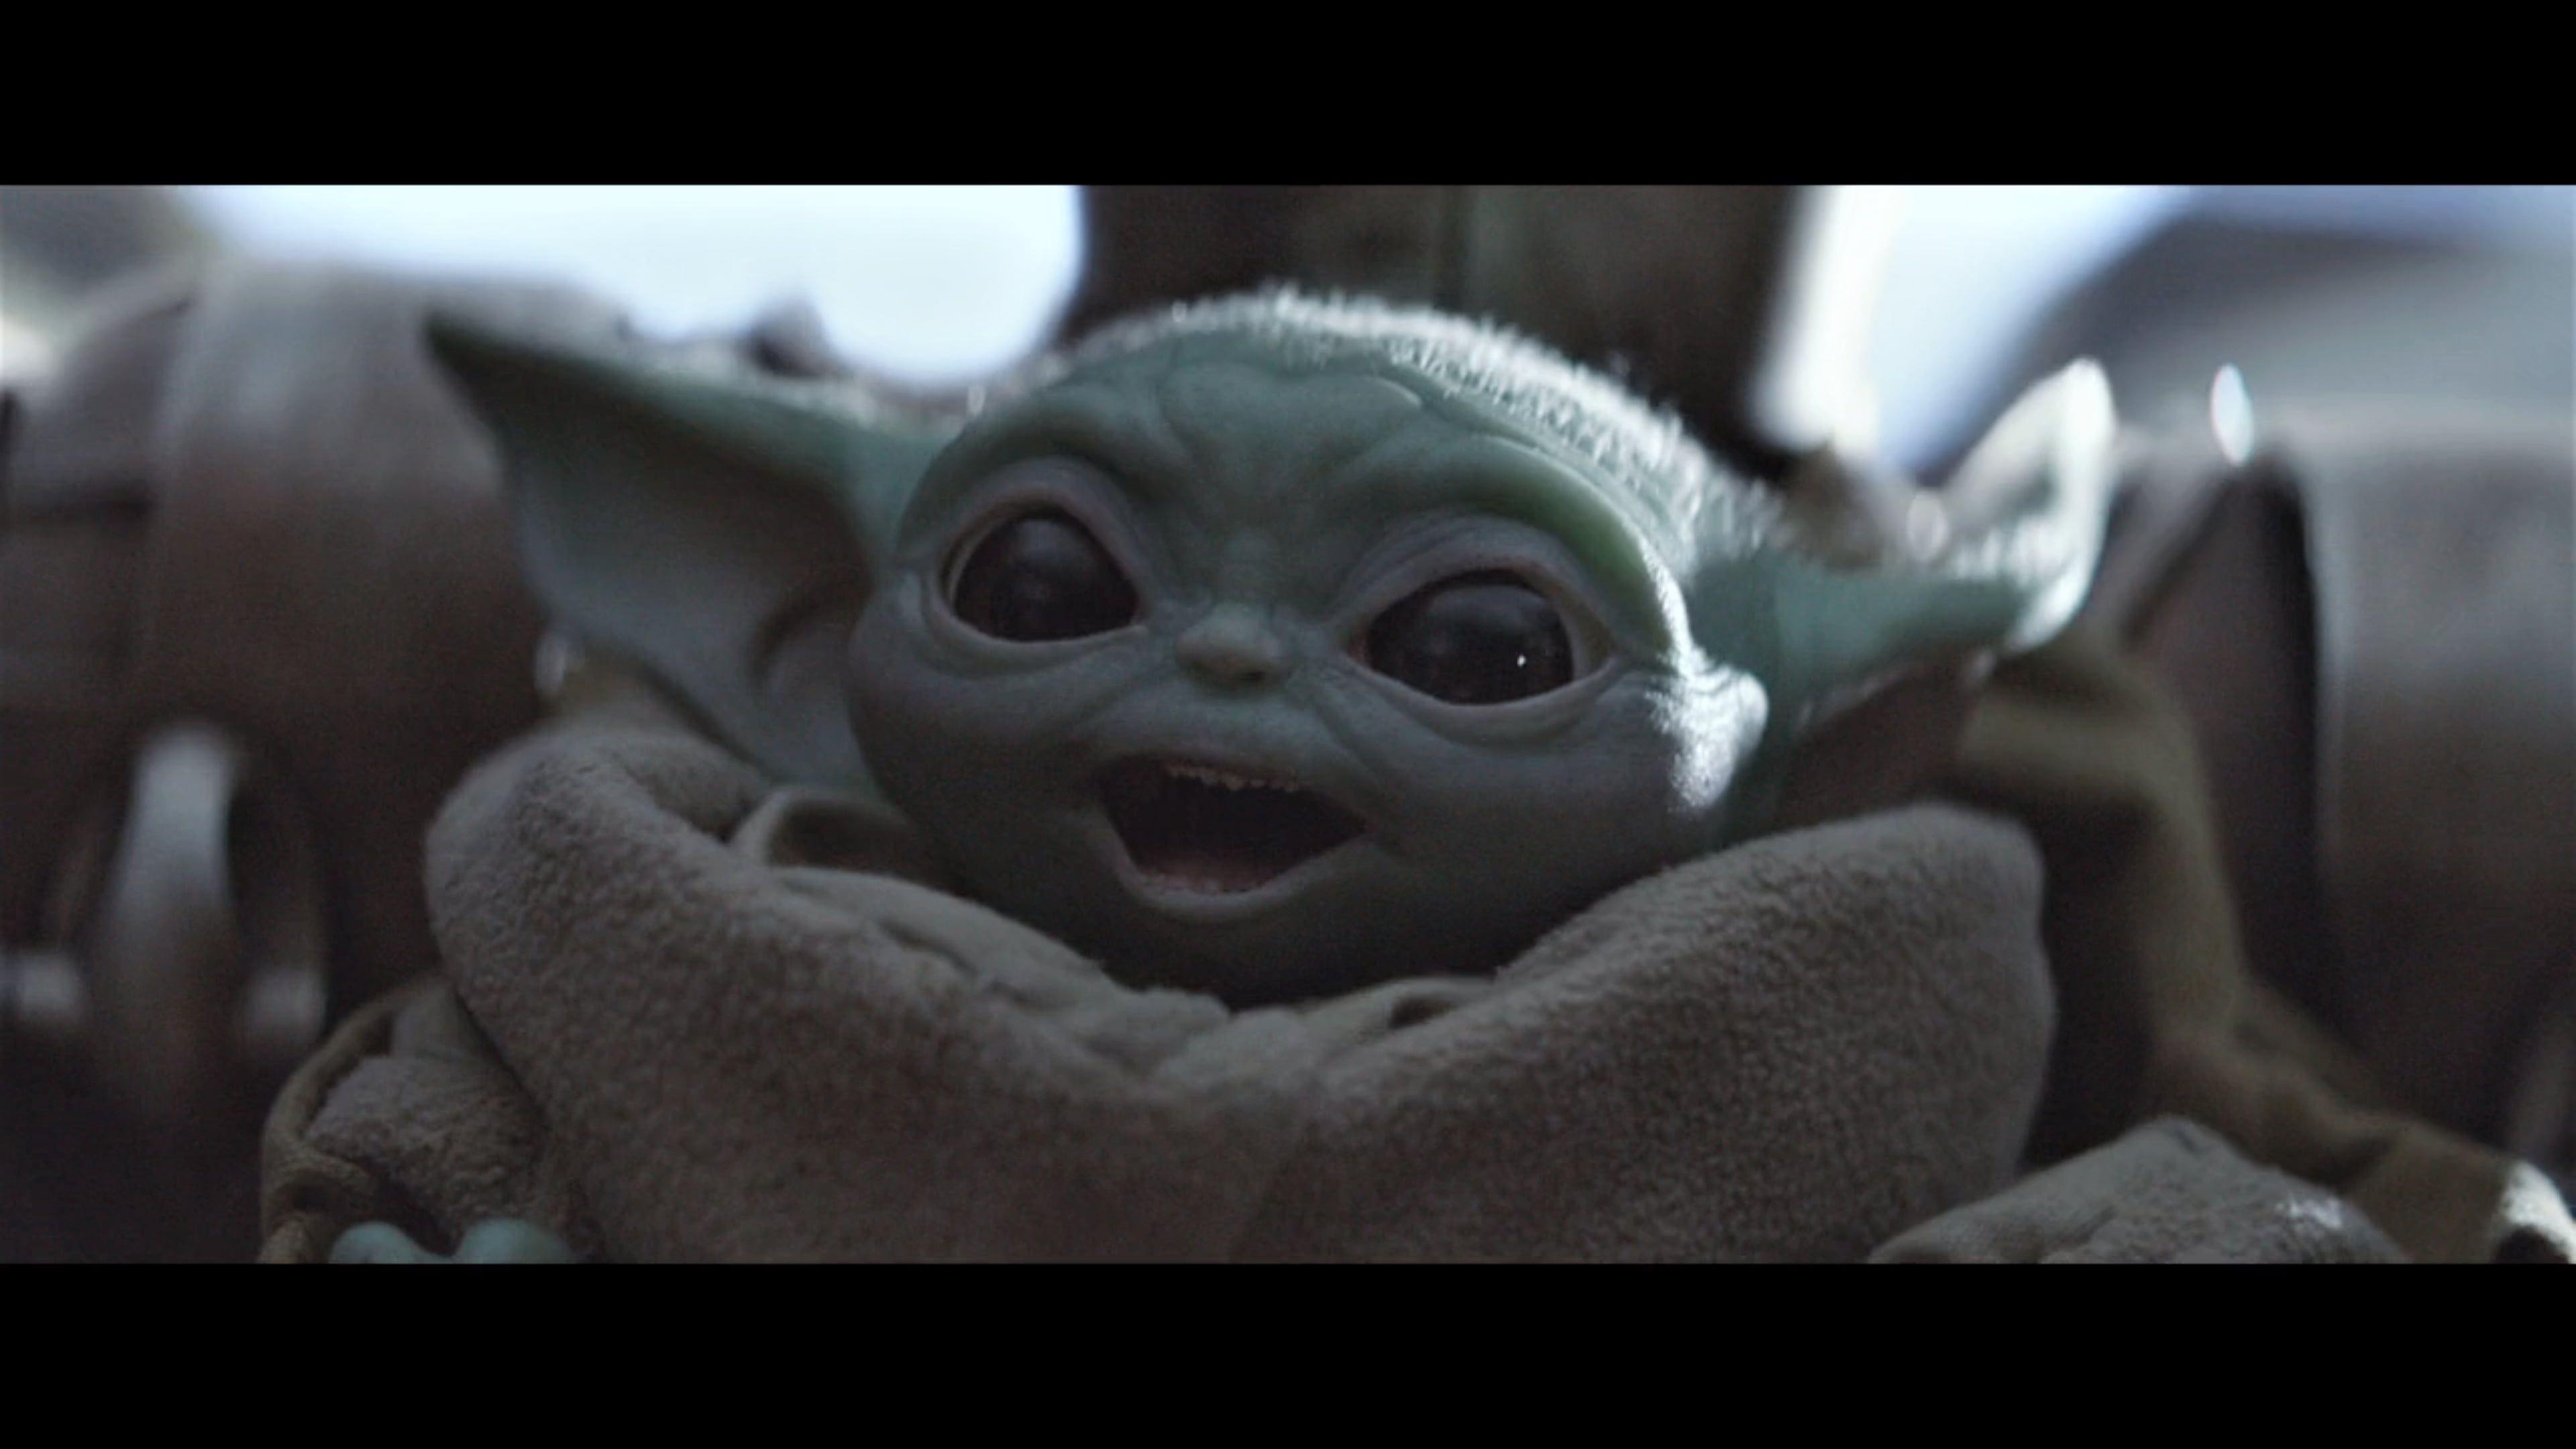 Baby Yoda The Mandalorian 4k Wallpaper Hdwallpaper Desktop In 2020 Yoda Wallpaper Yoda Meme Star Wars Memes